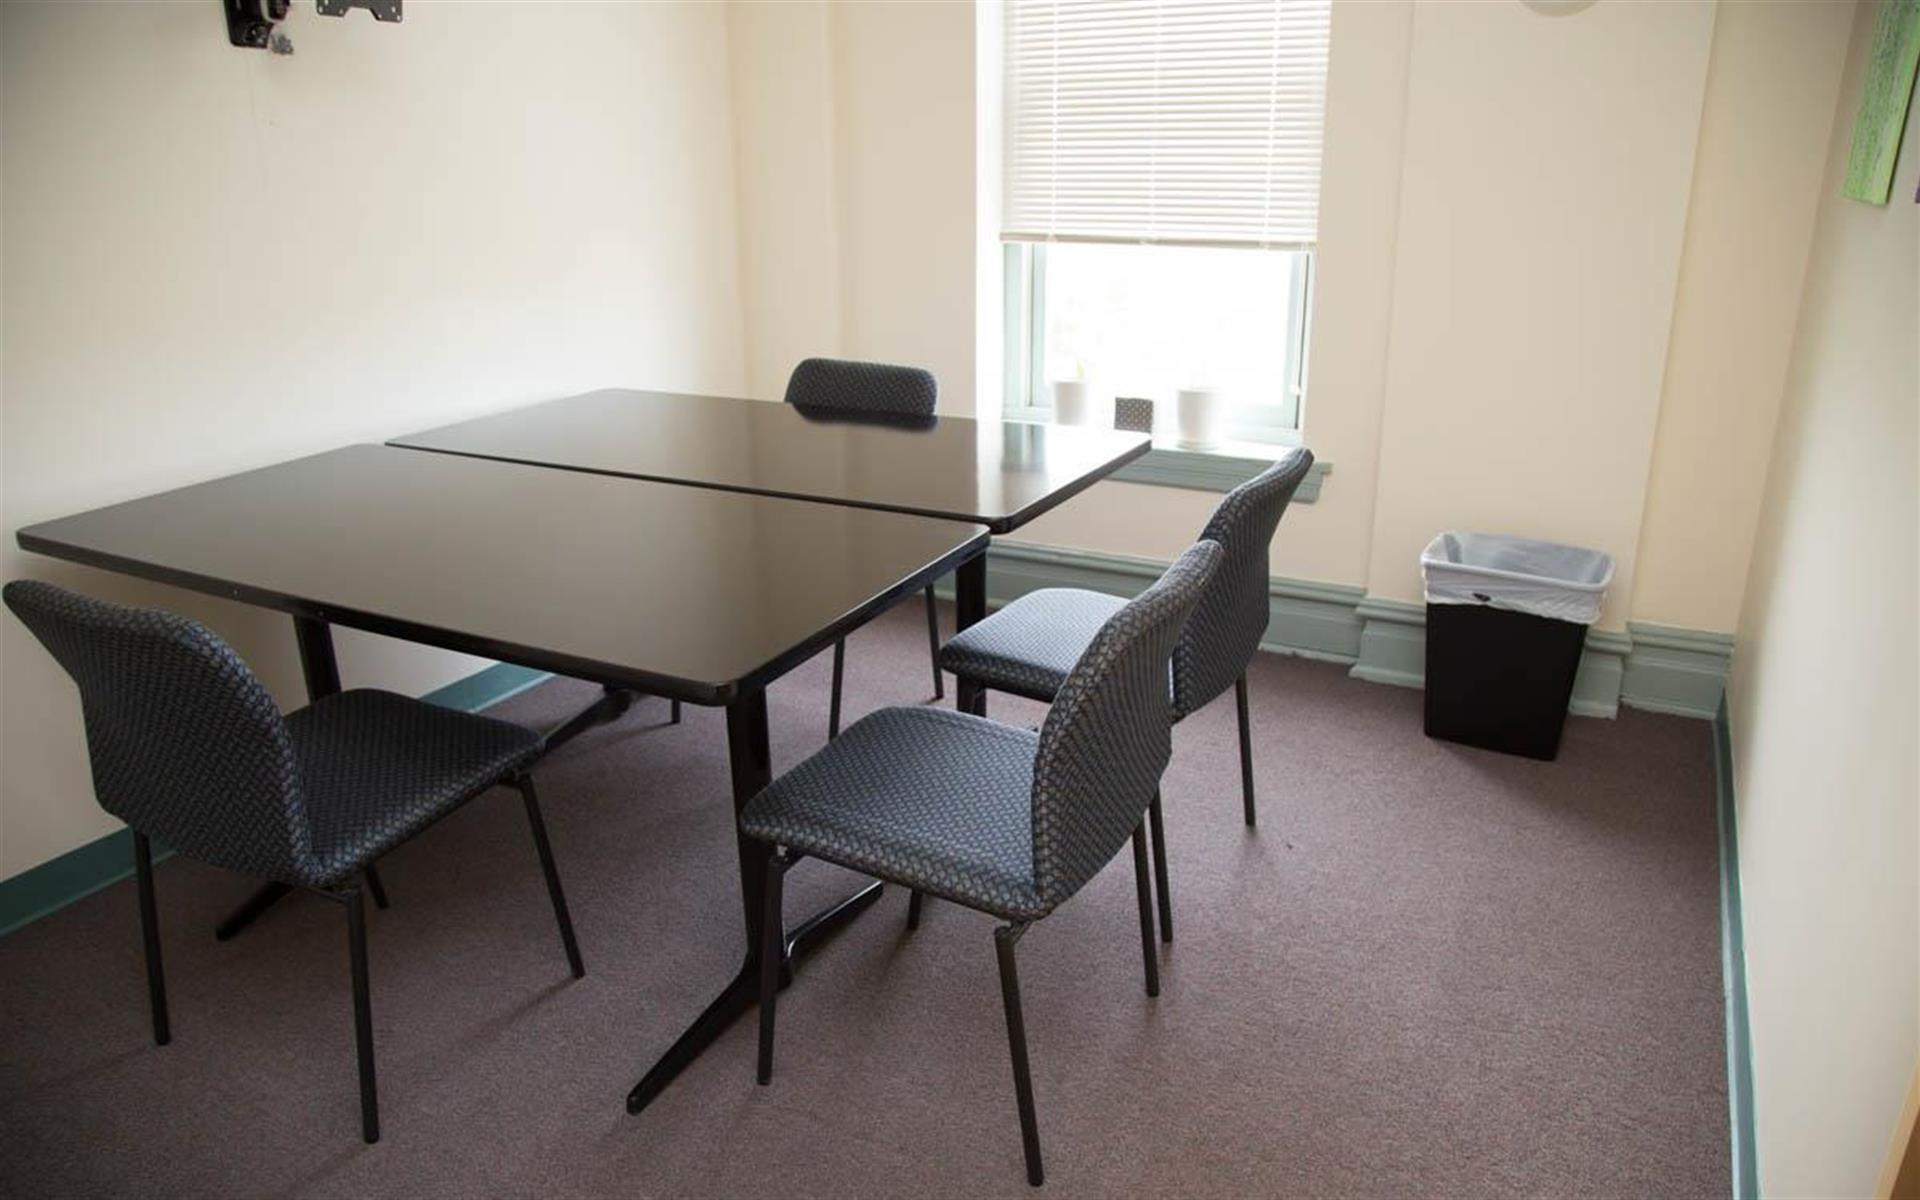 Productivity Pointe - Room 4 - Media Center